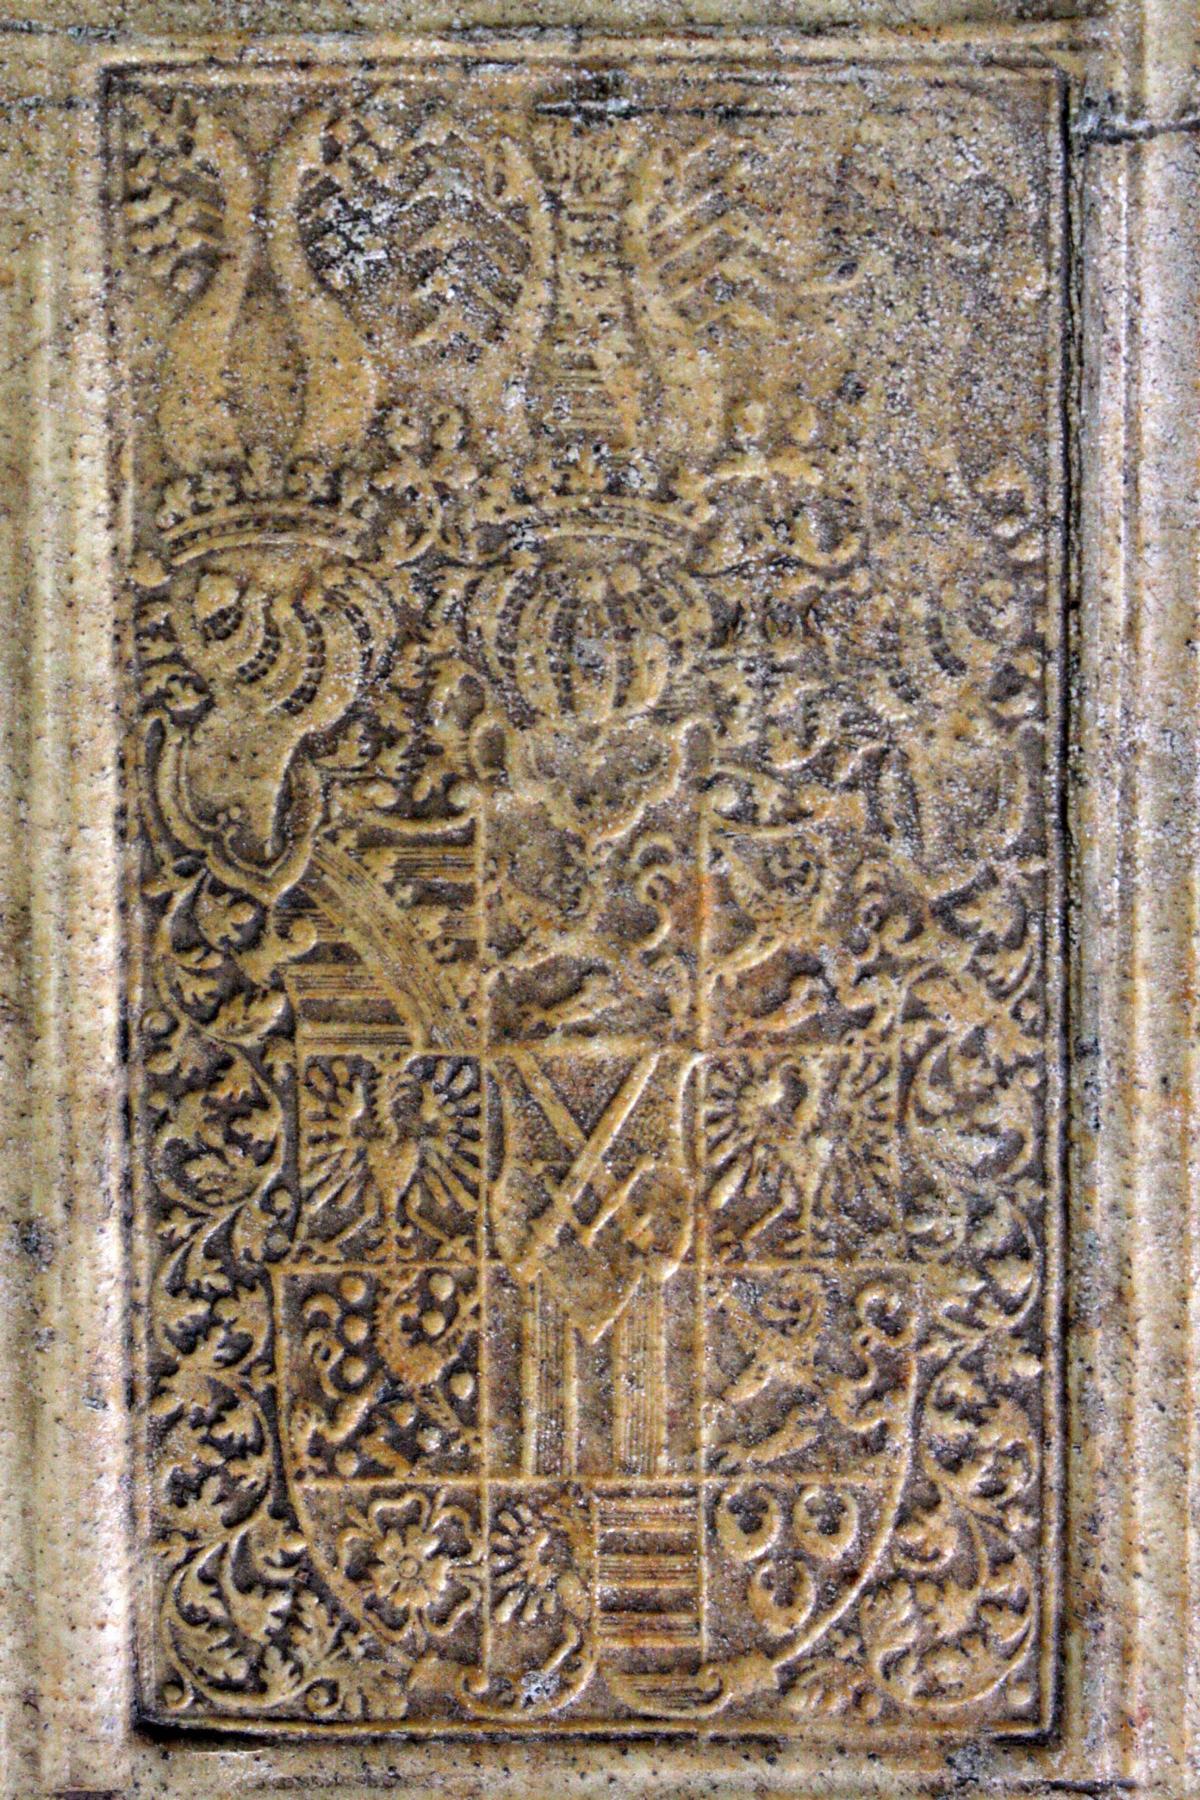 Griechische-Lateinische Bibel, Novum Testamentum 1582-22